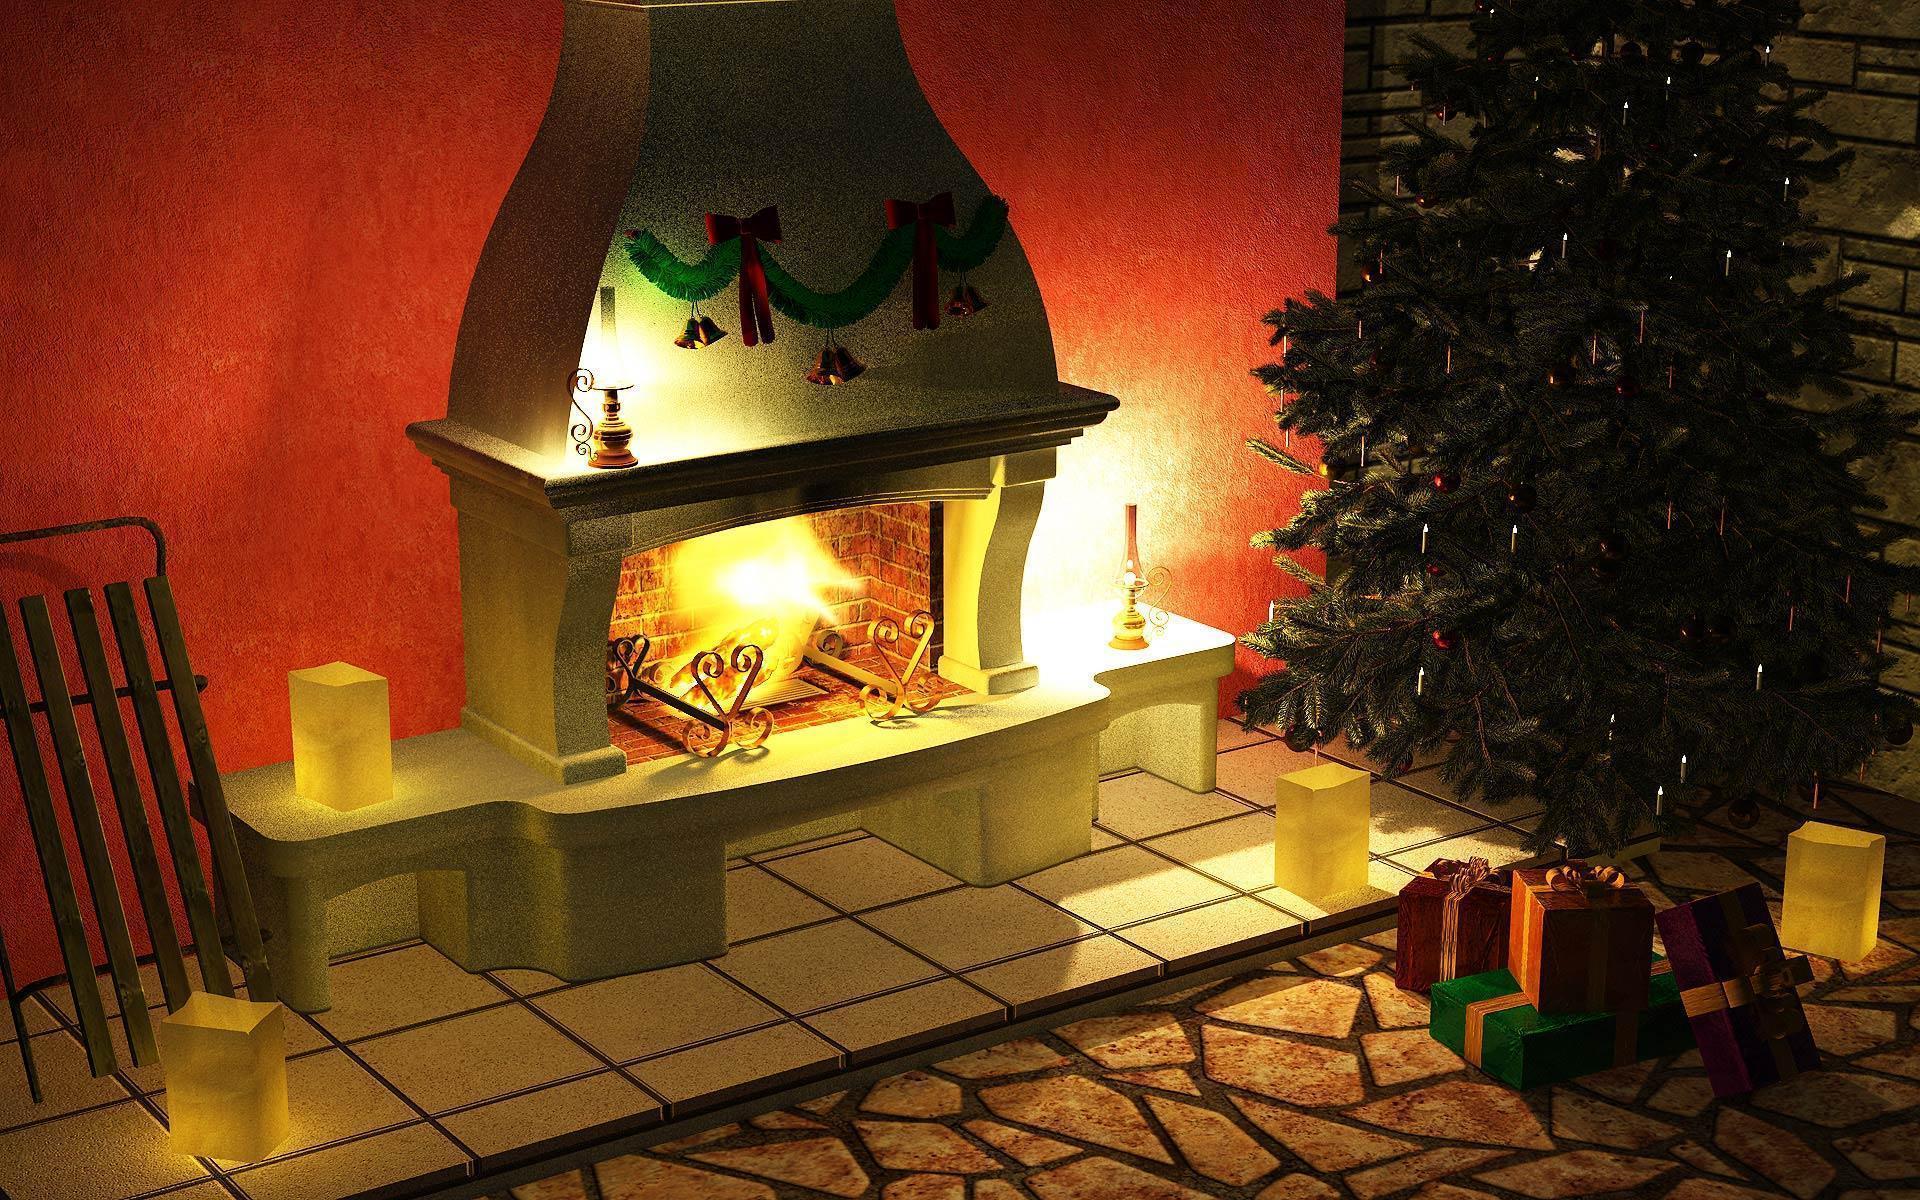 Desktop 3d Wallpapers Holidays Christmas Free Christmas Fireplace Wallpapers Wallpaper Cave